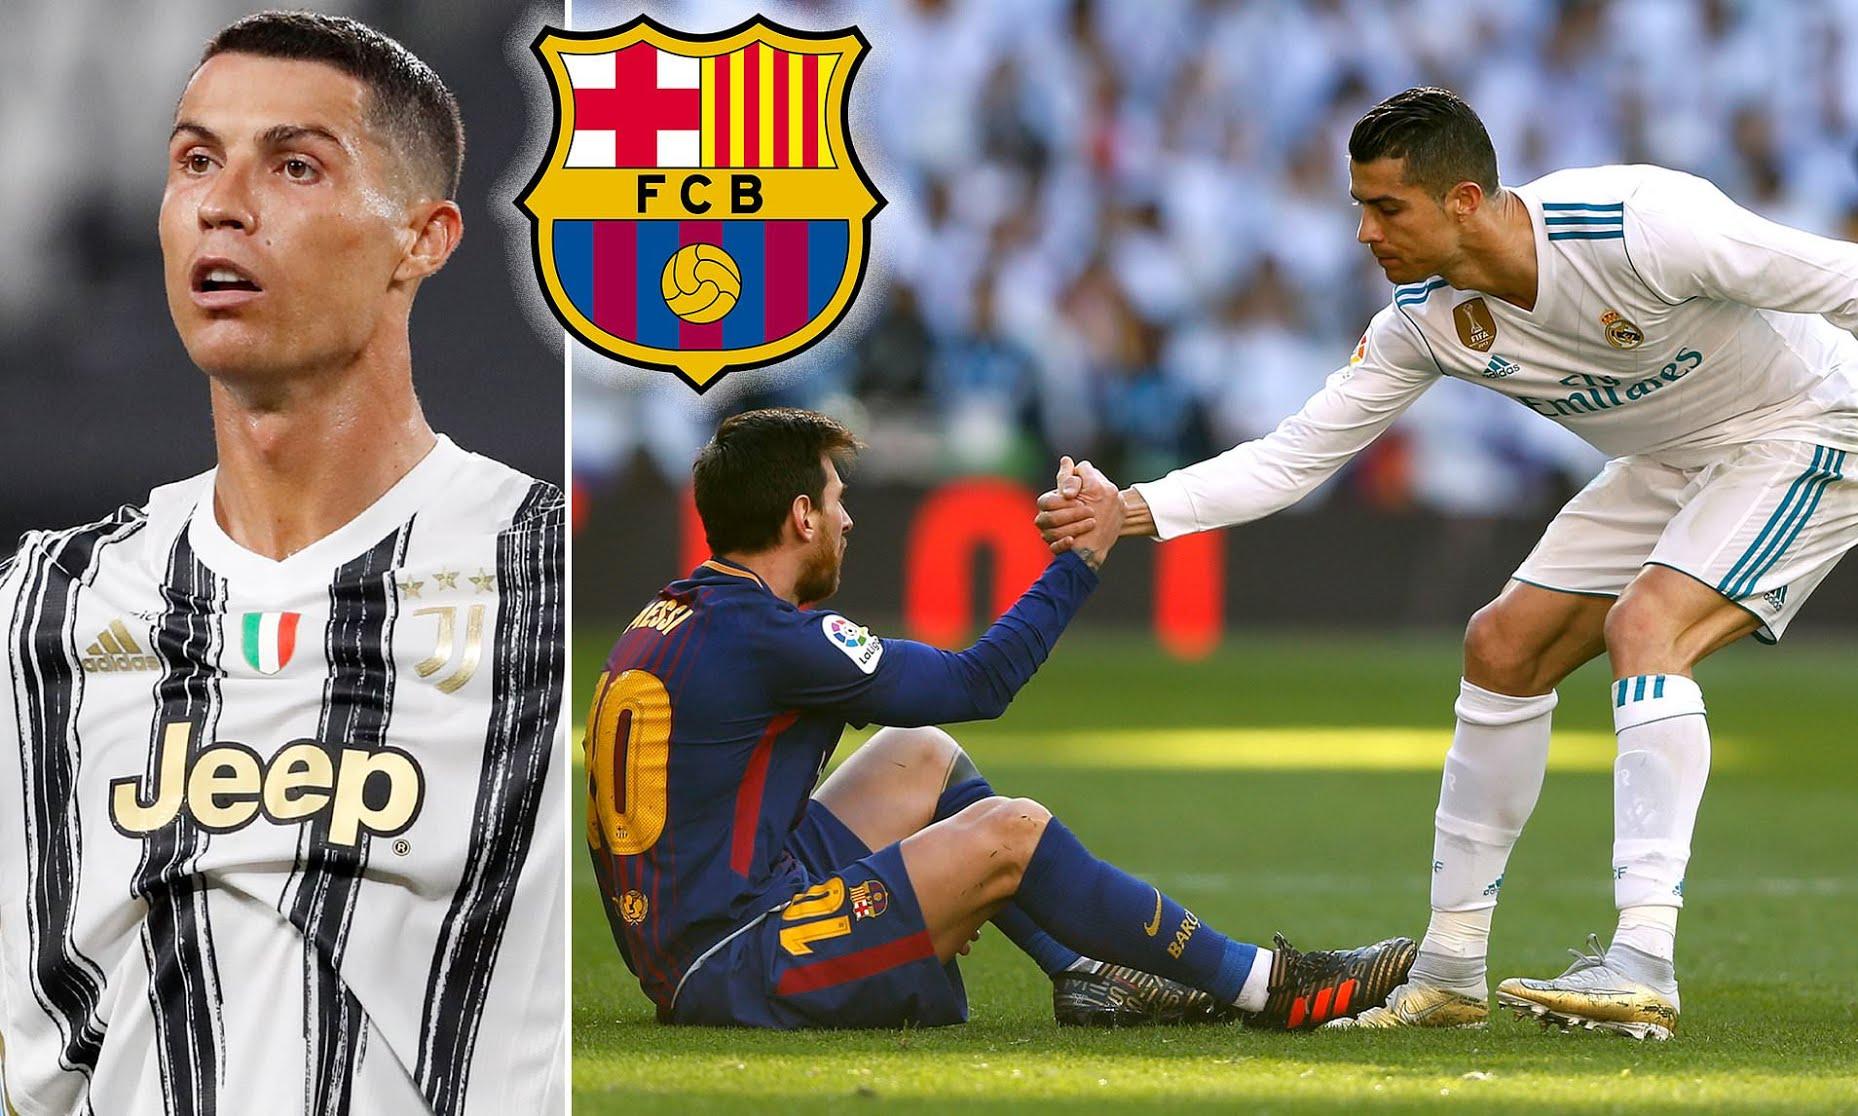 Juventus Offers Cristiano Ronaldo To Barcelona